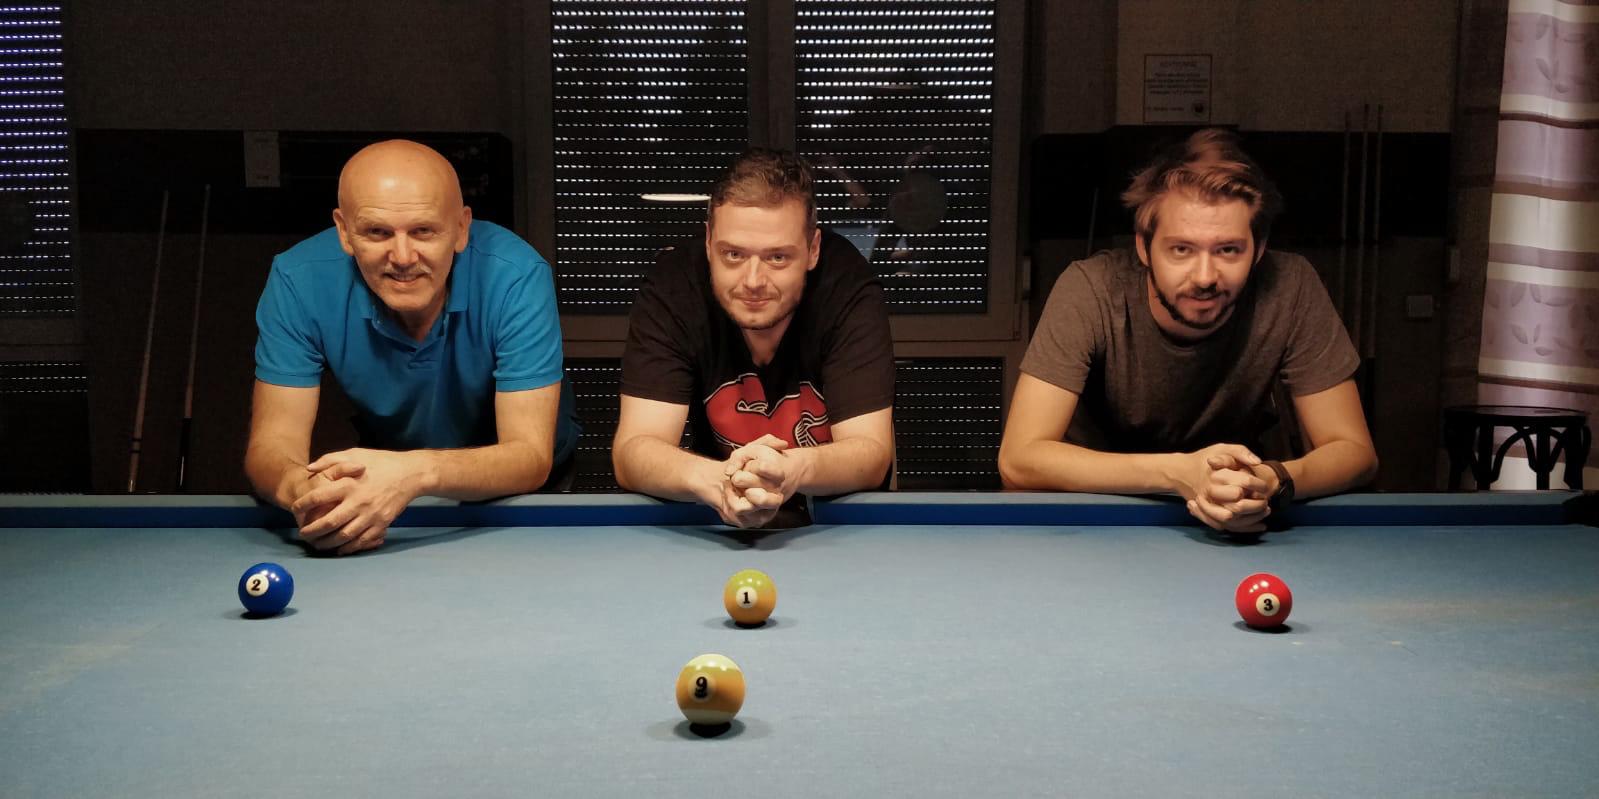 Michael Milosevic (Platz 2), Markus Schwarz (Platz 1) und Joscha Zirkelbach (Platz 3)